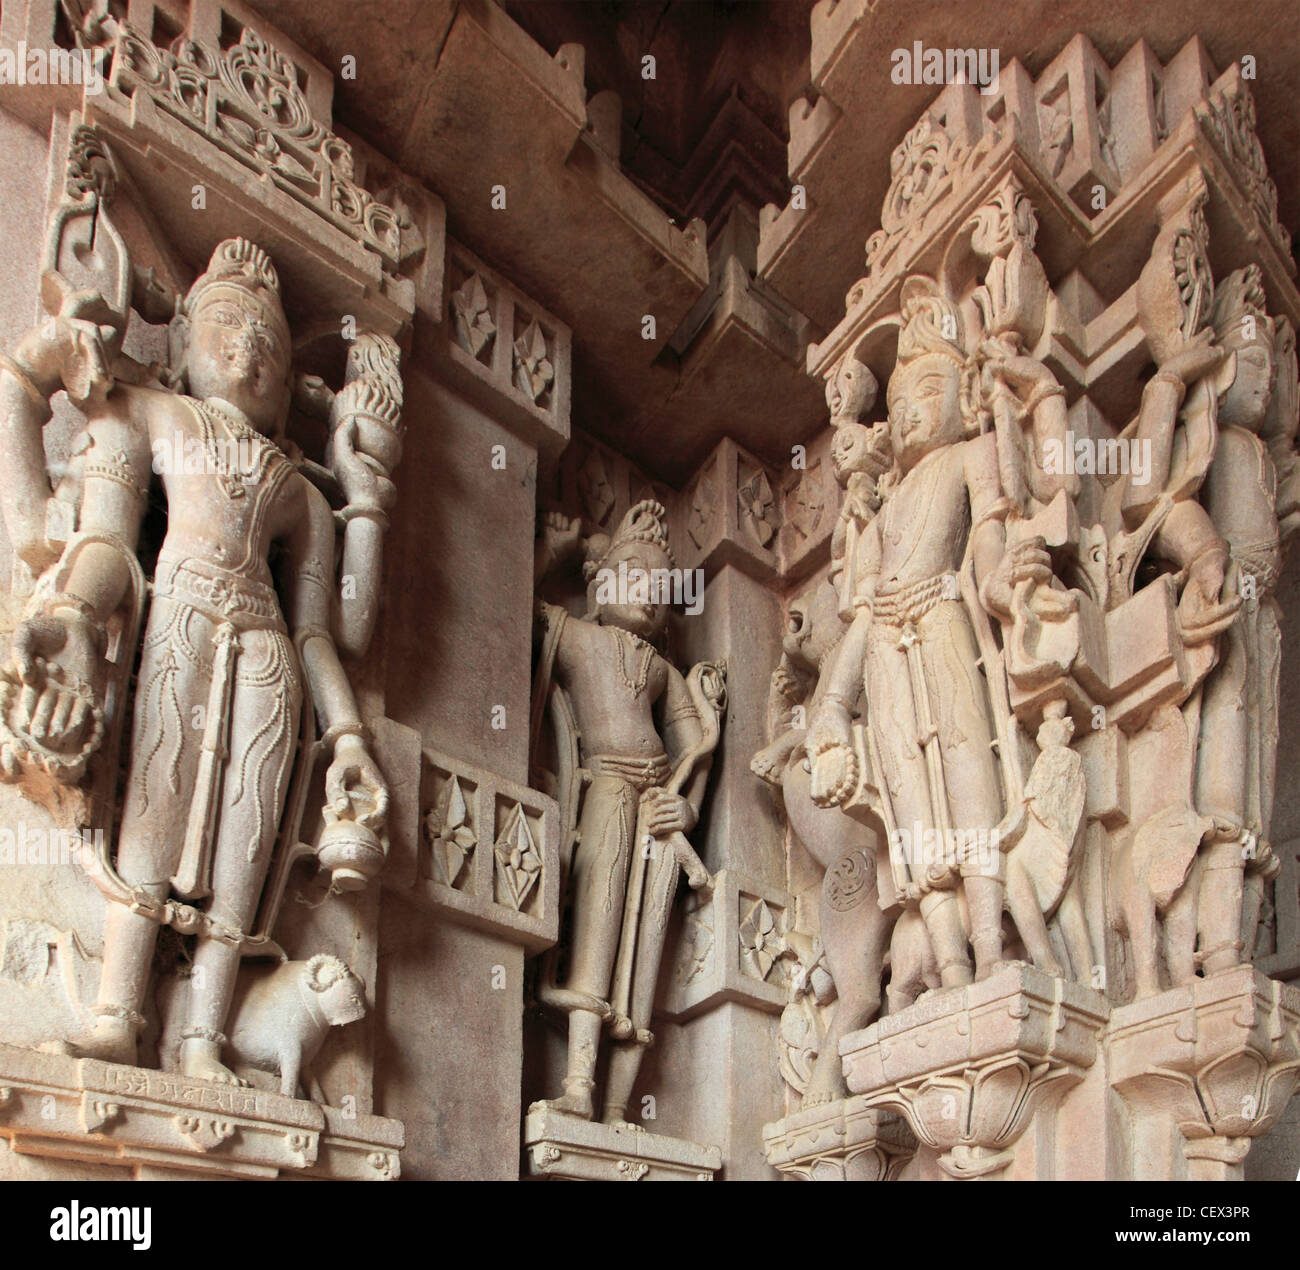 India, Rajasthan, Jodhpur, Mandore Gardens, cenotaphs of Jodhpur's rulers, detail, statues, - Stock Image